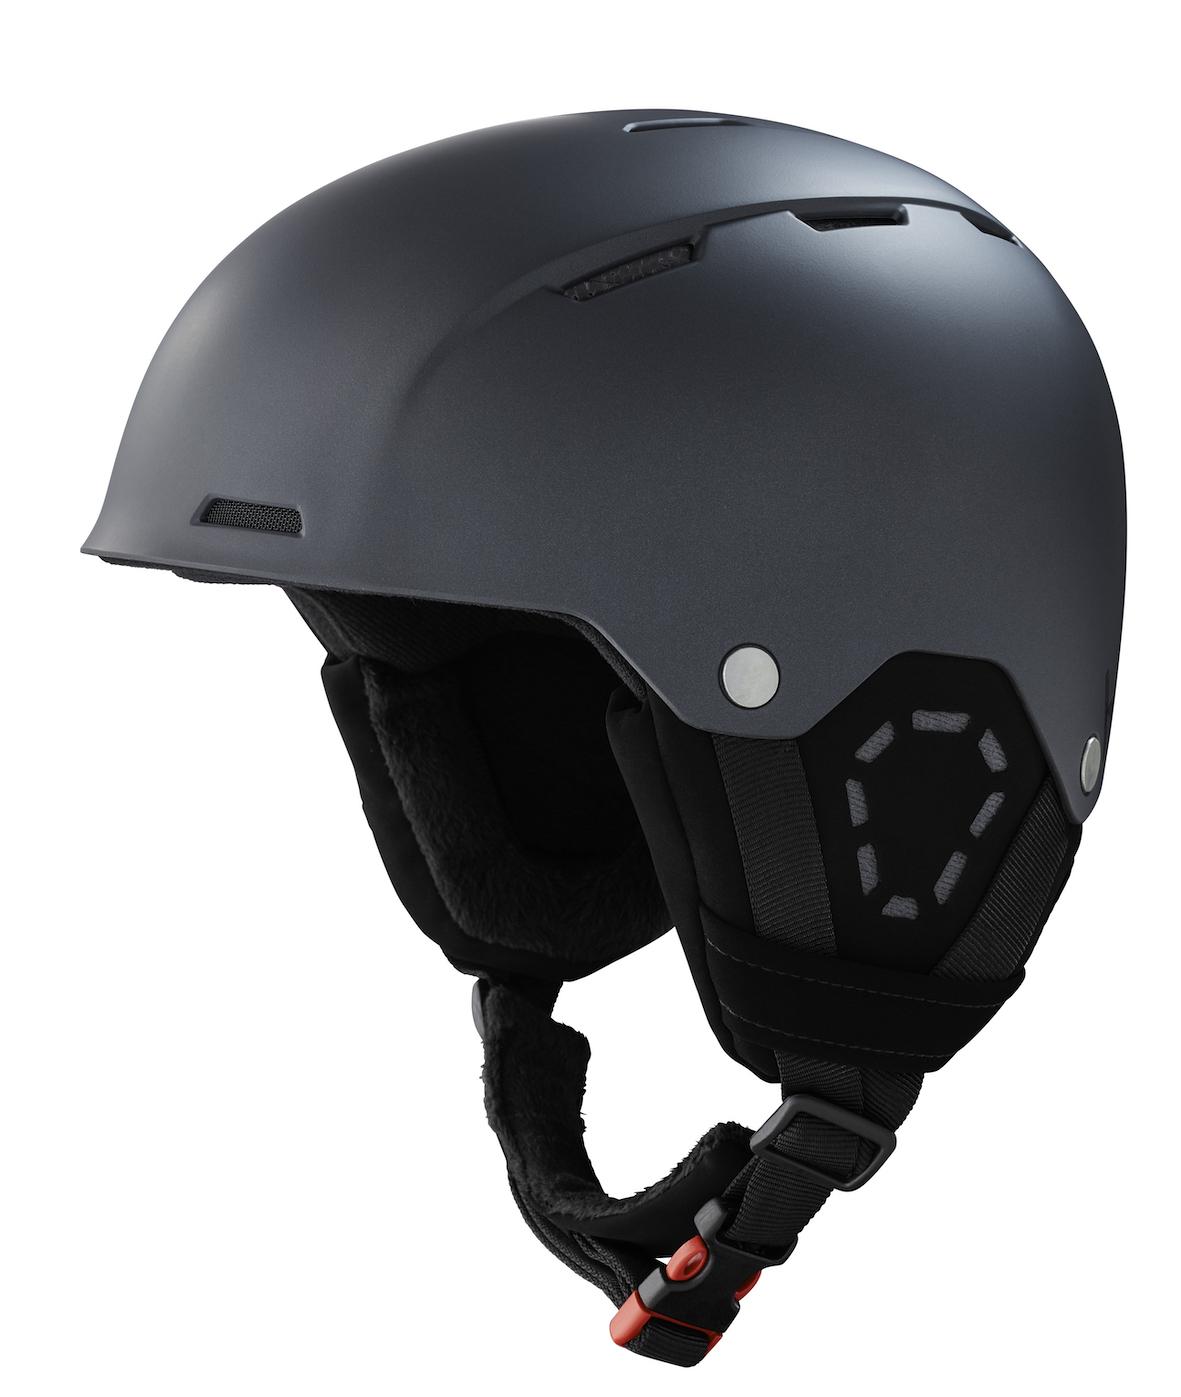 Head FW20/21 Snow Helmets